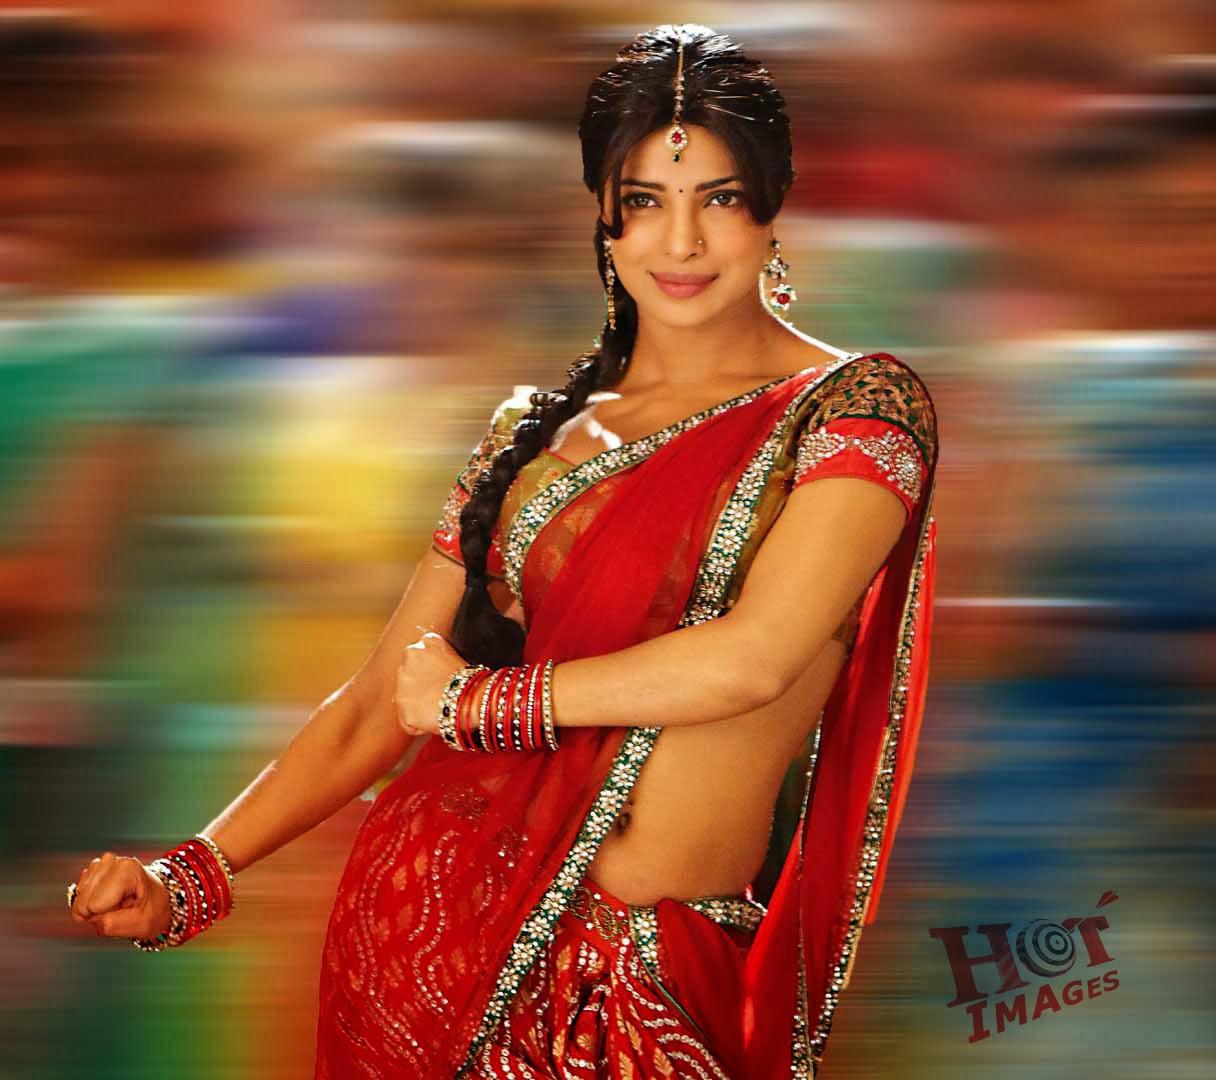 Priyanka Chopra Hot red Saree in gunday